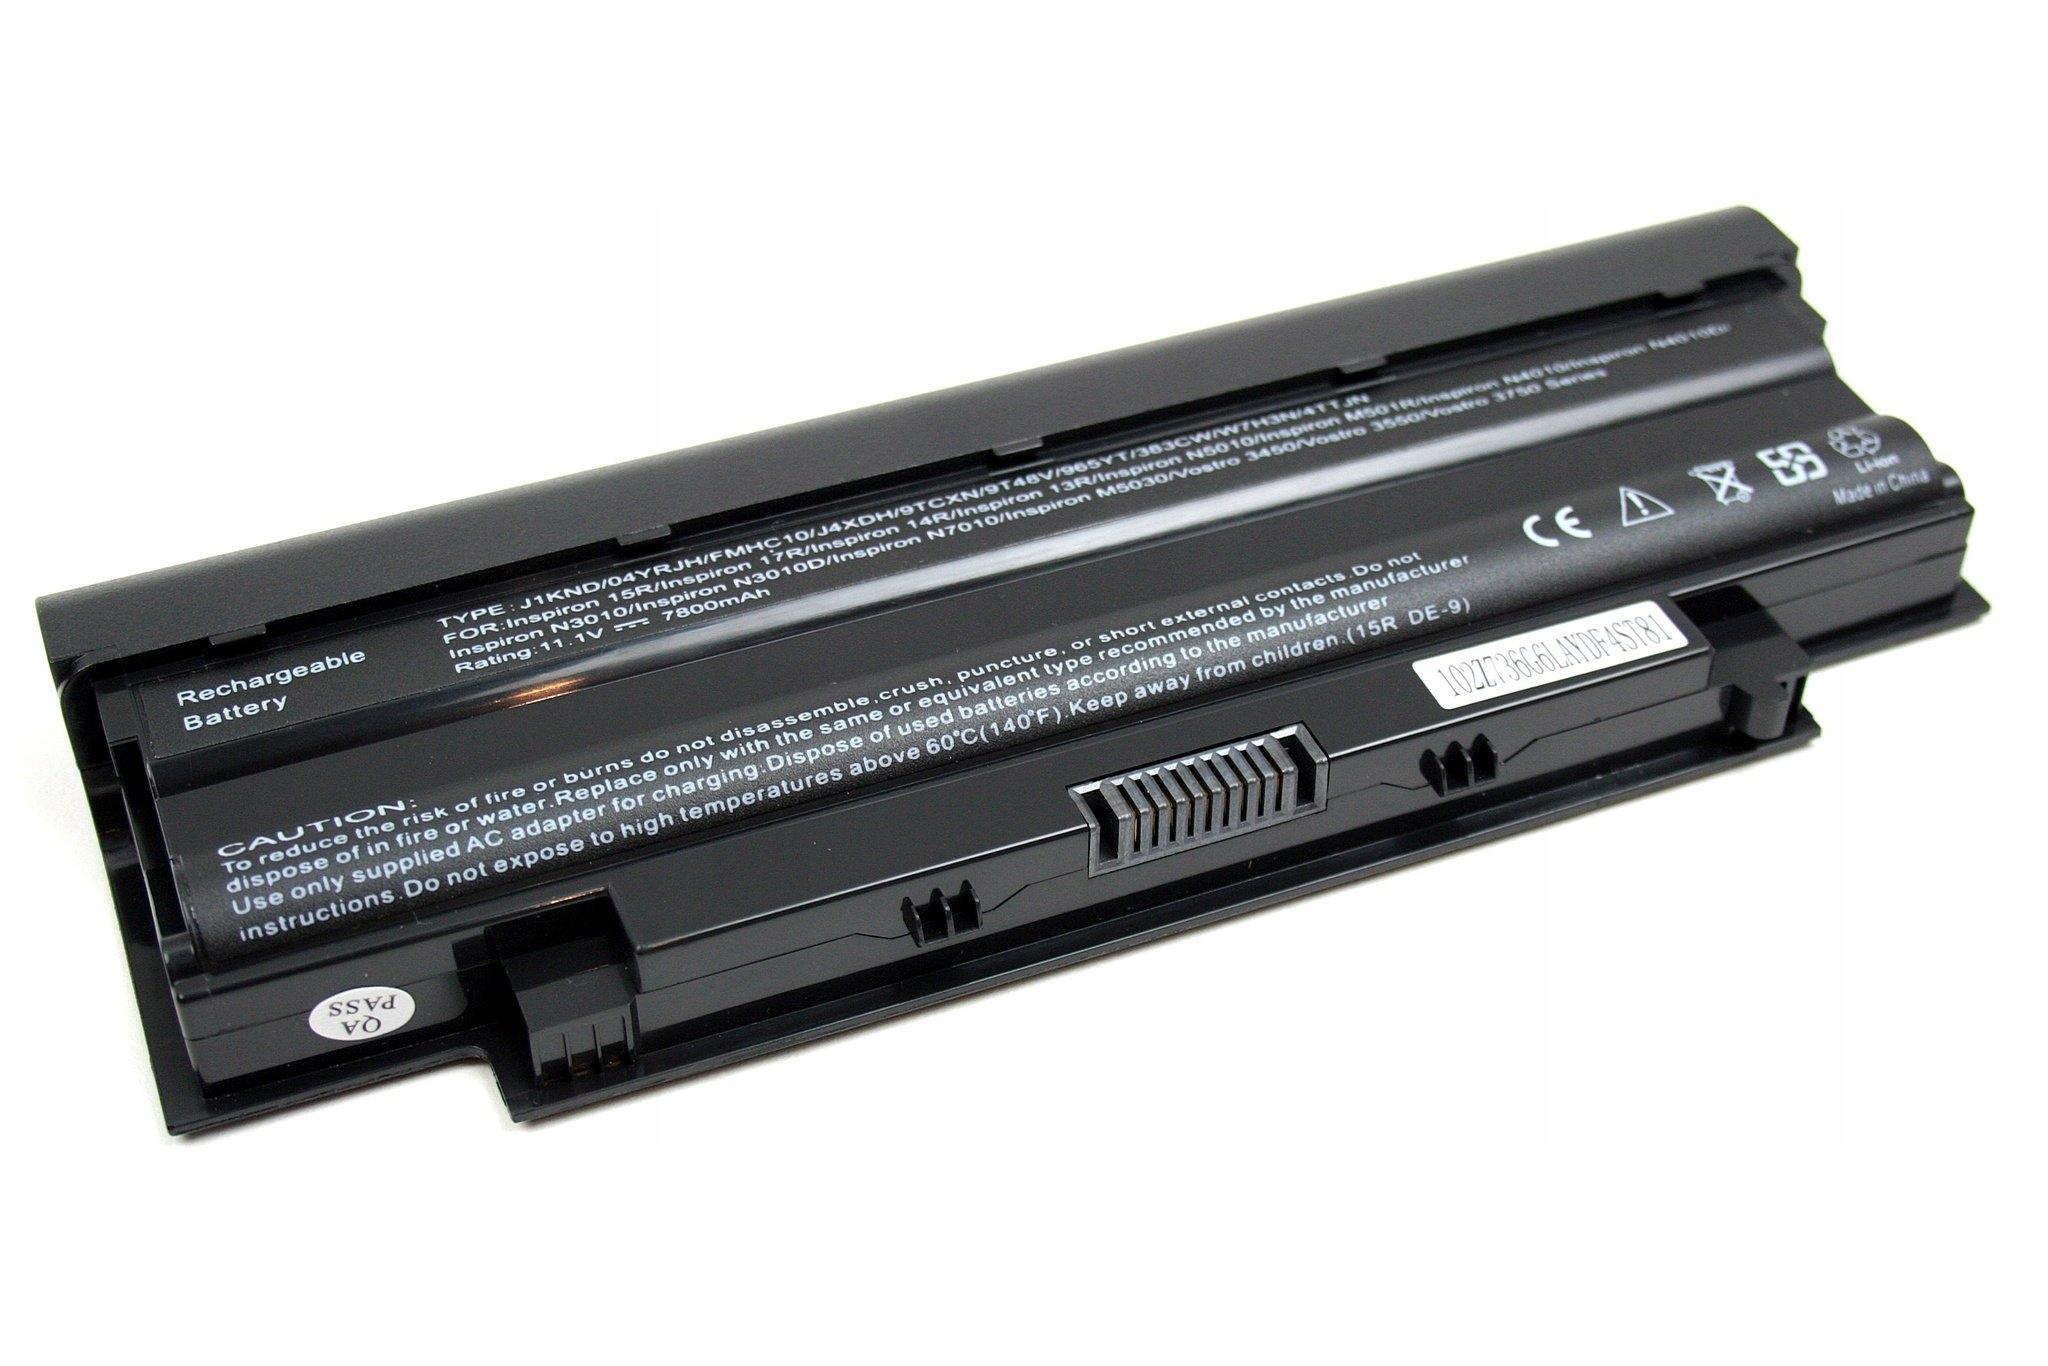 BATERIA AKUMULATOR DELL N5010 N5030 N5050 N5110 3550 J1KND - Baterie do laptopów